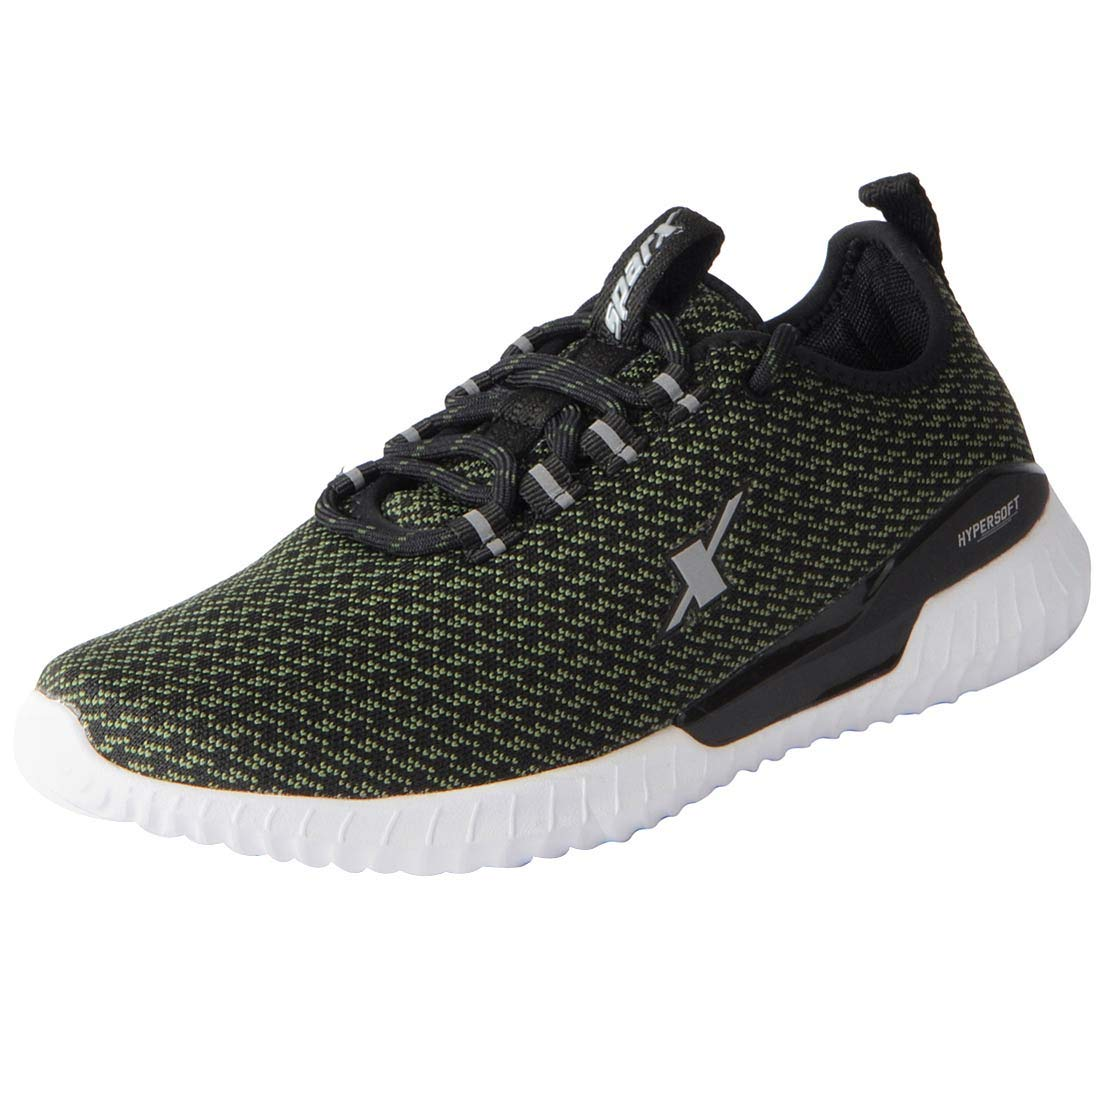 Sparx Men's Mesh Sports Running Shoes